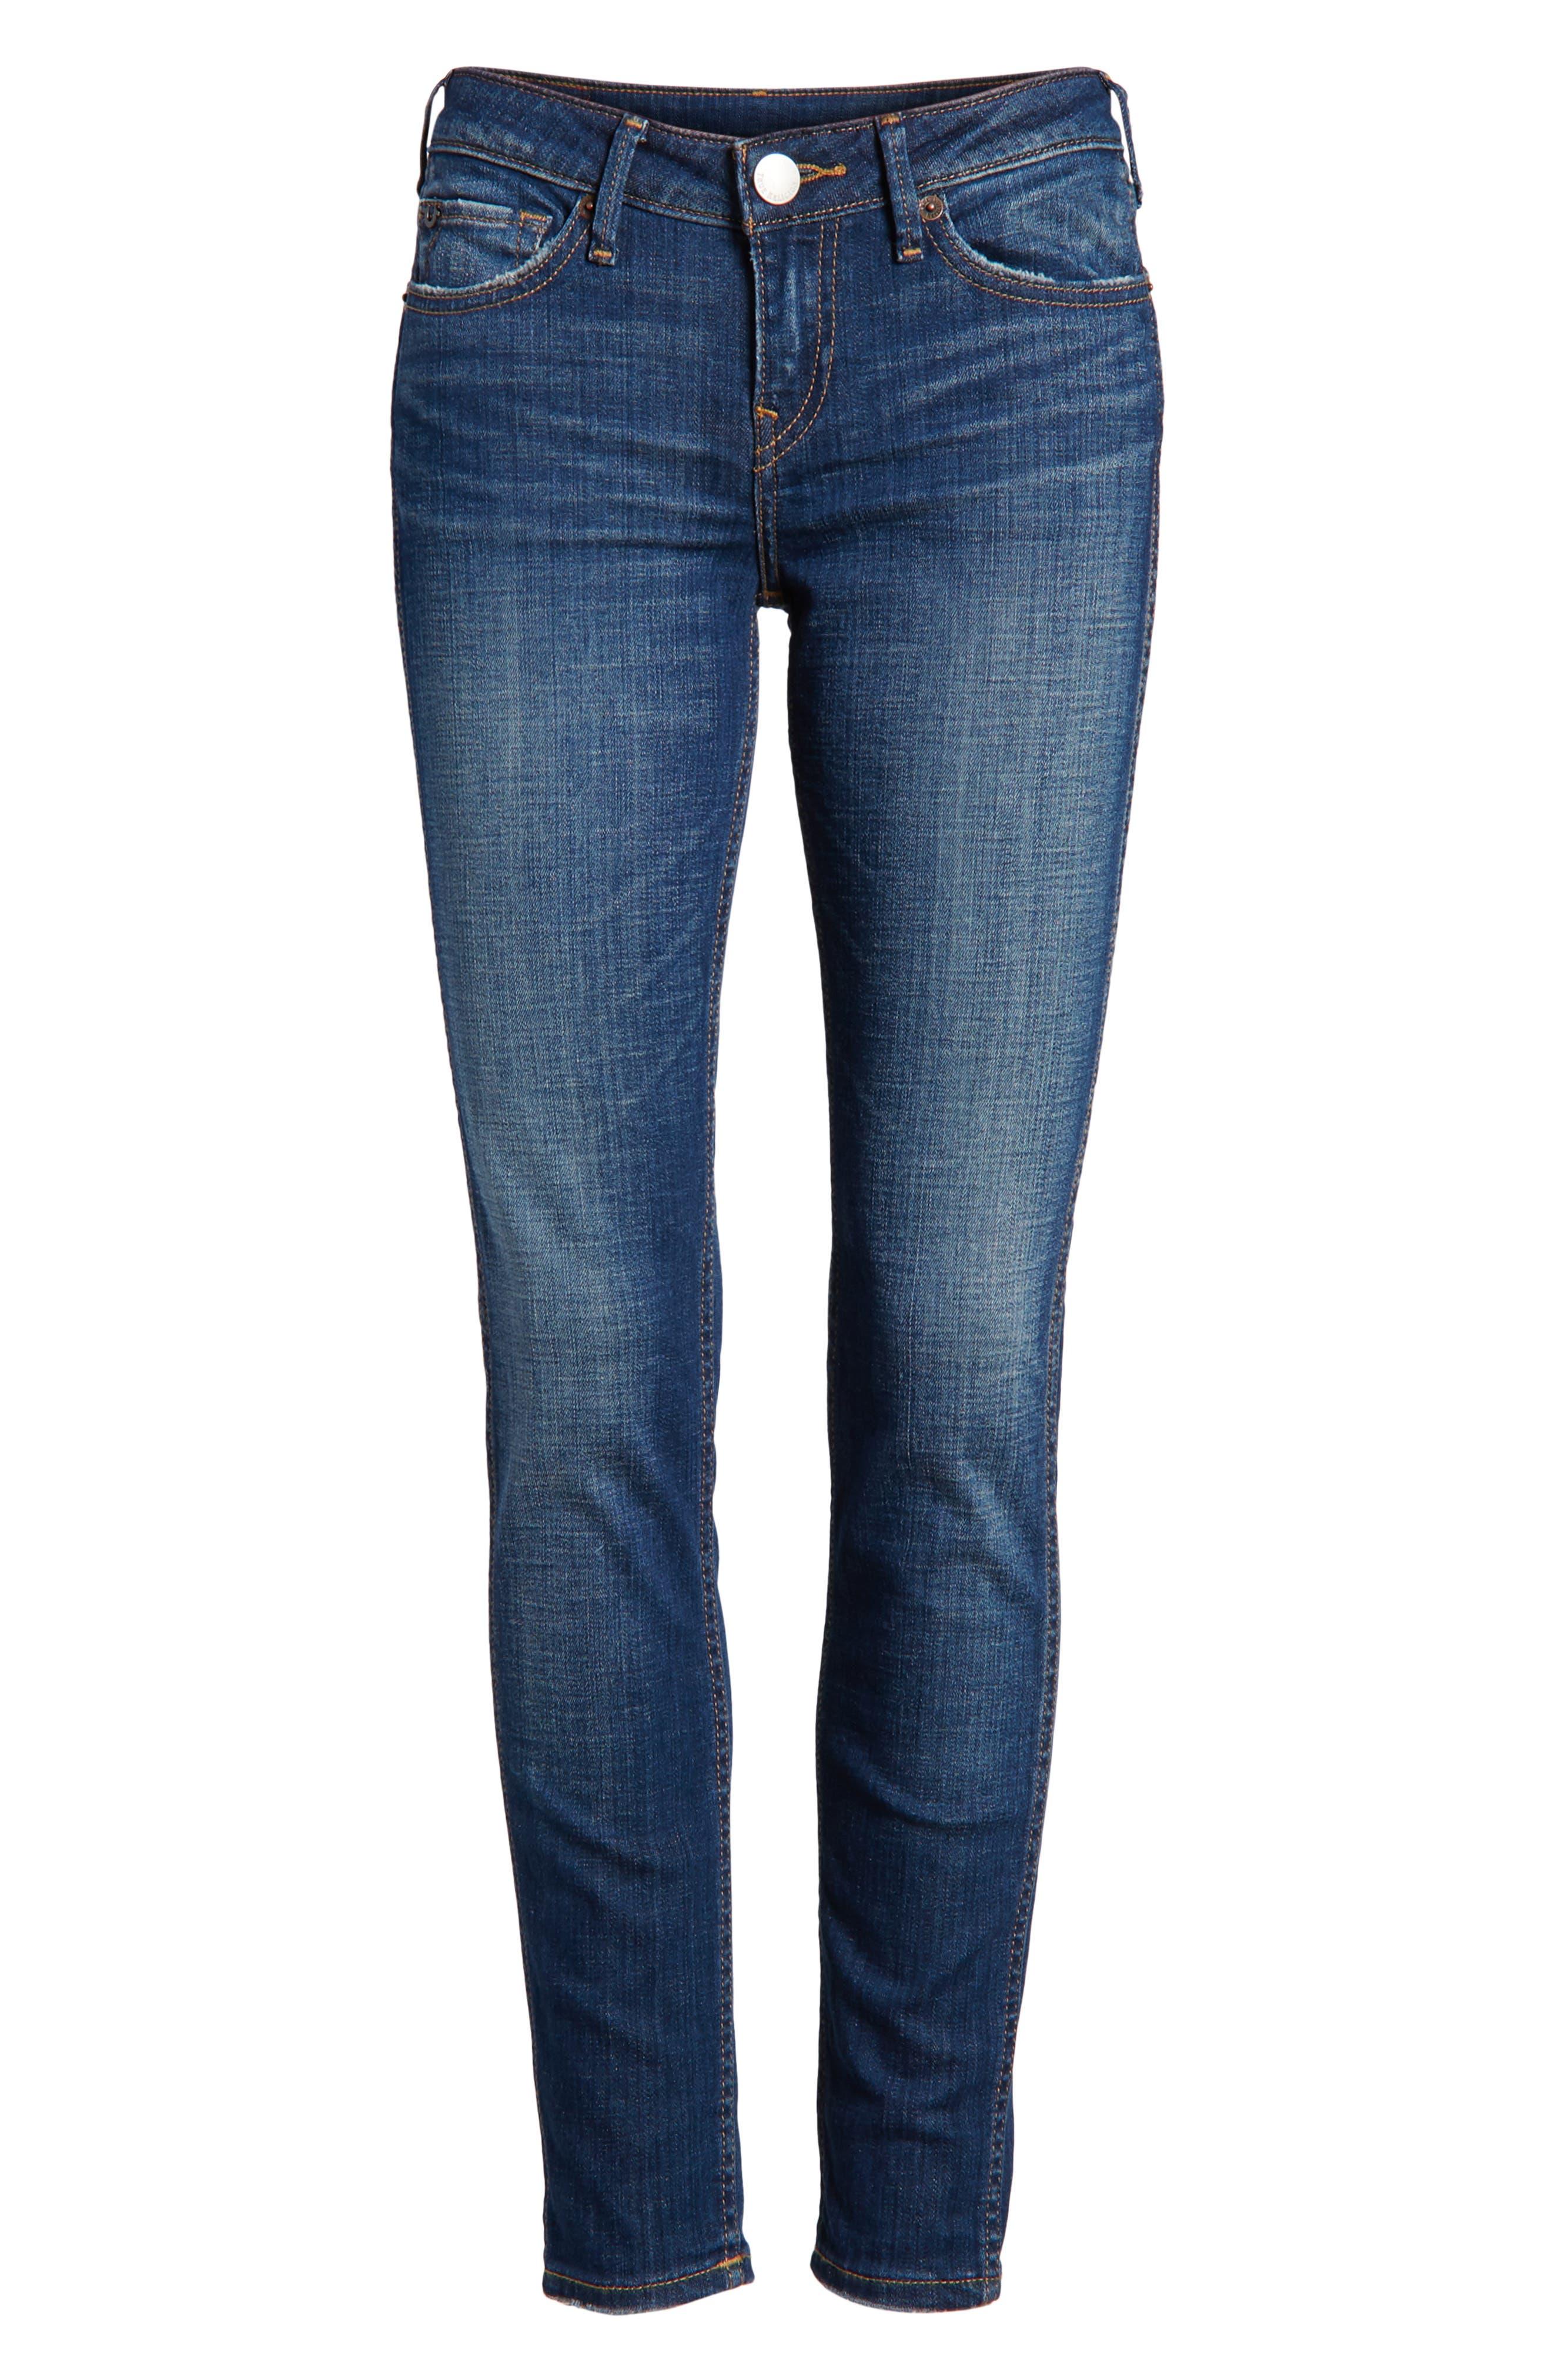 Halle Mid Rise Super Skinny Jeans,                             Alternate thumbnail 7, color,                             Esqm Gen Y